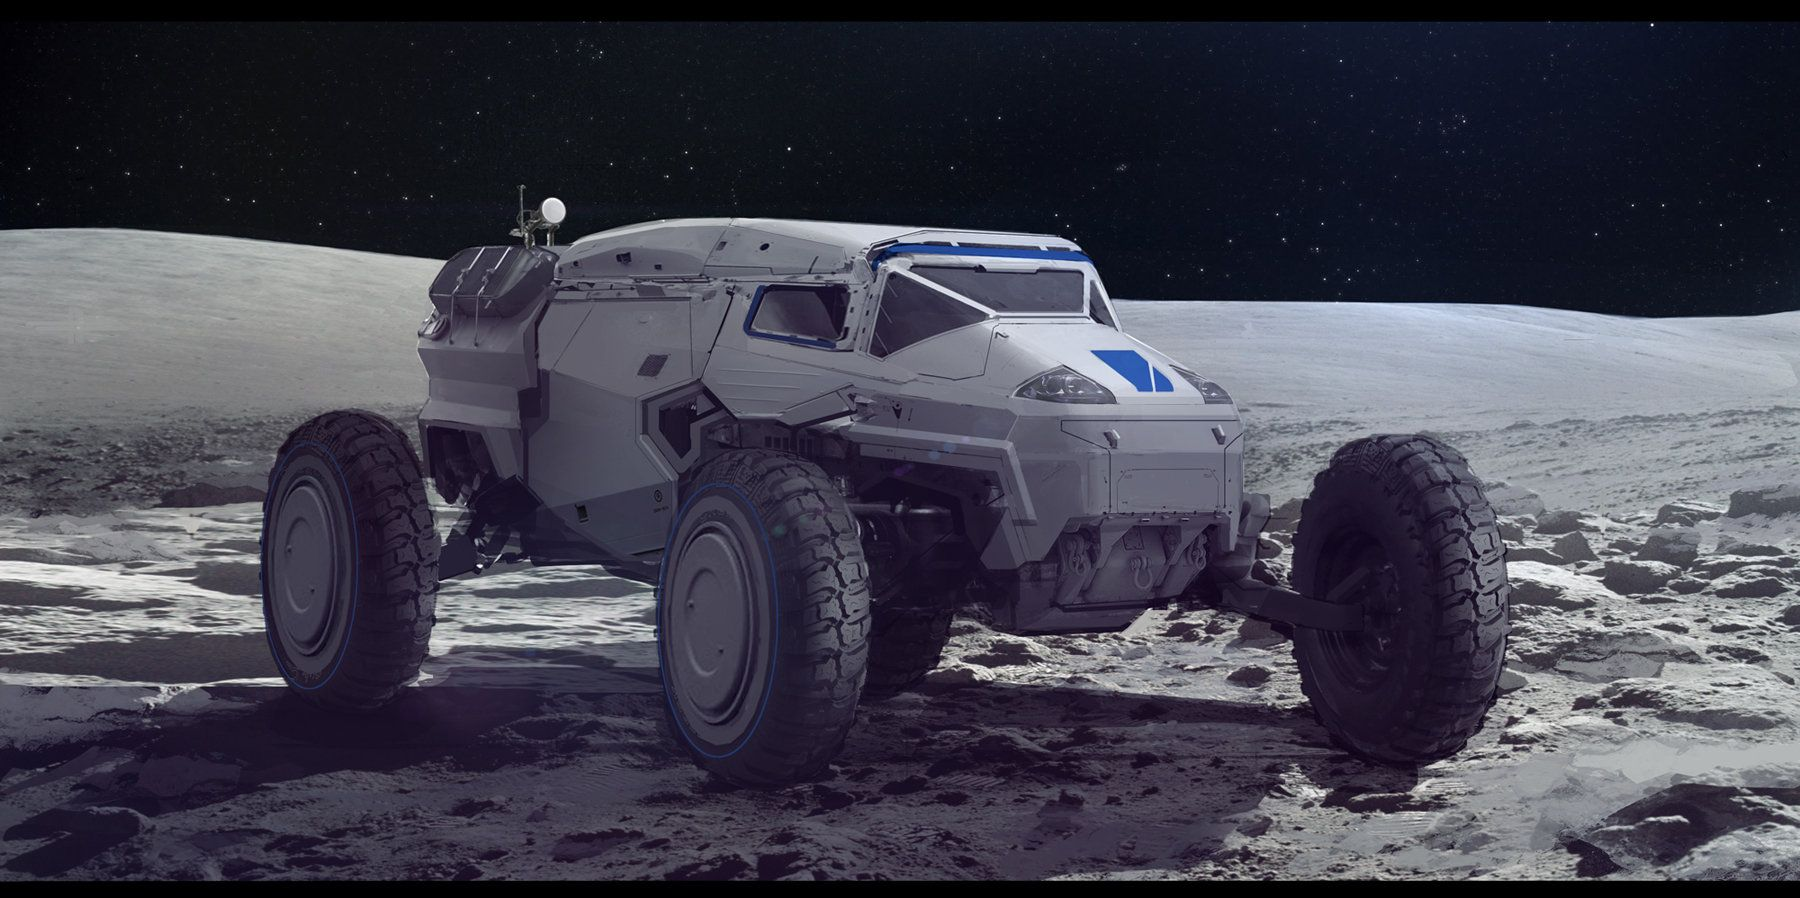 ArtStation - Rover, Sam Brown